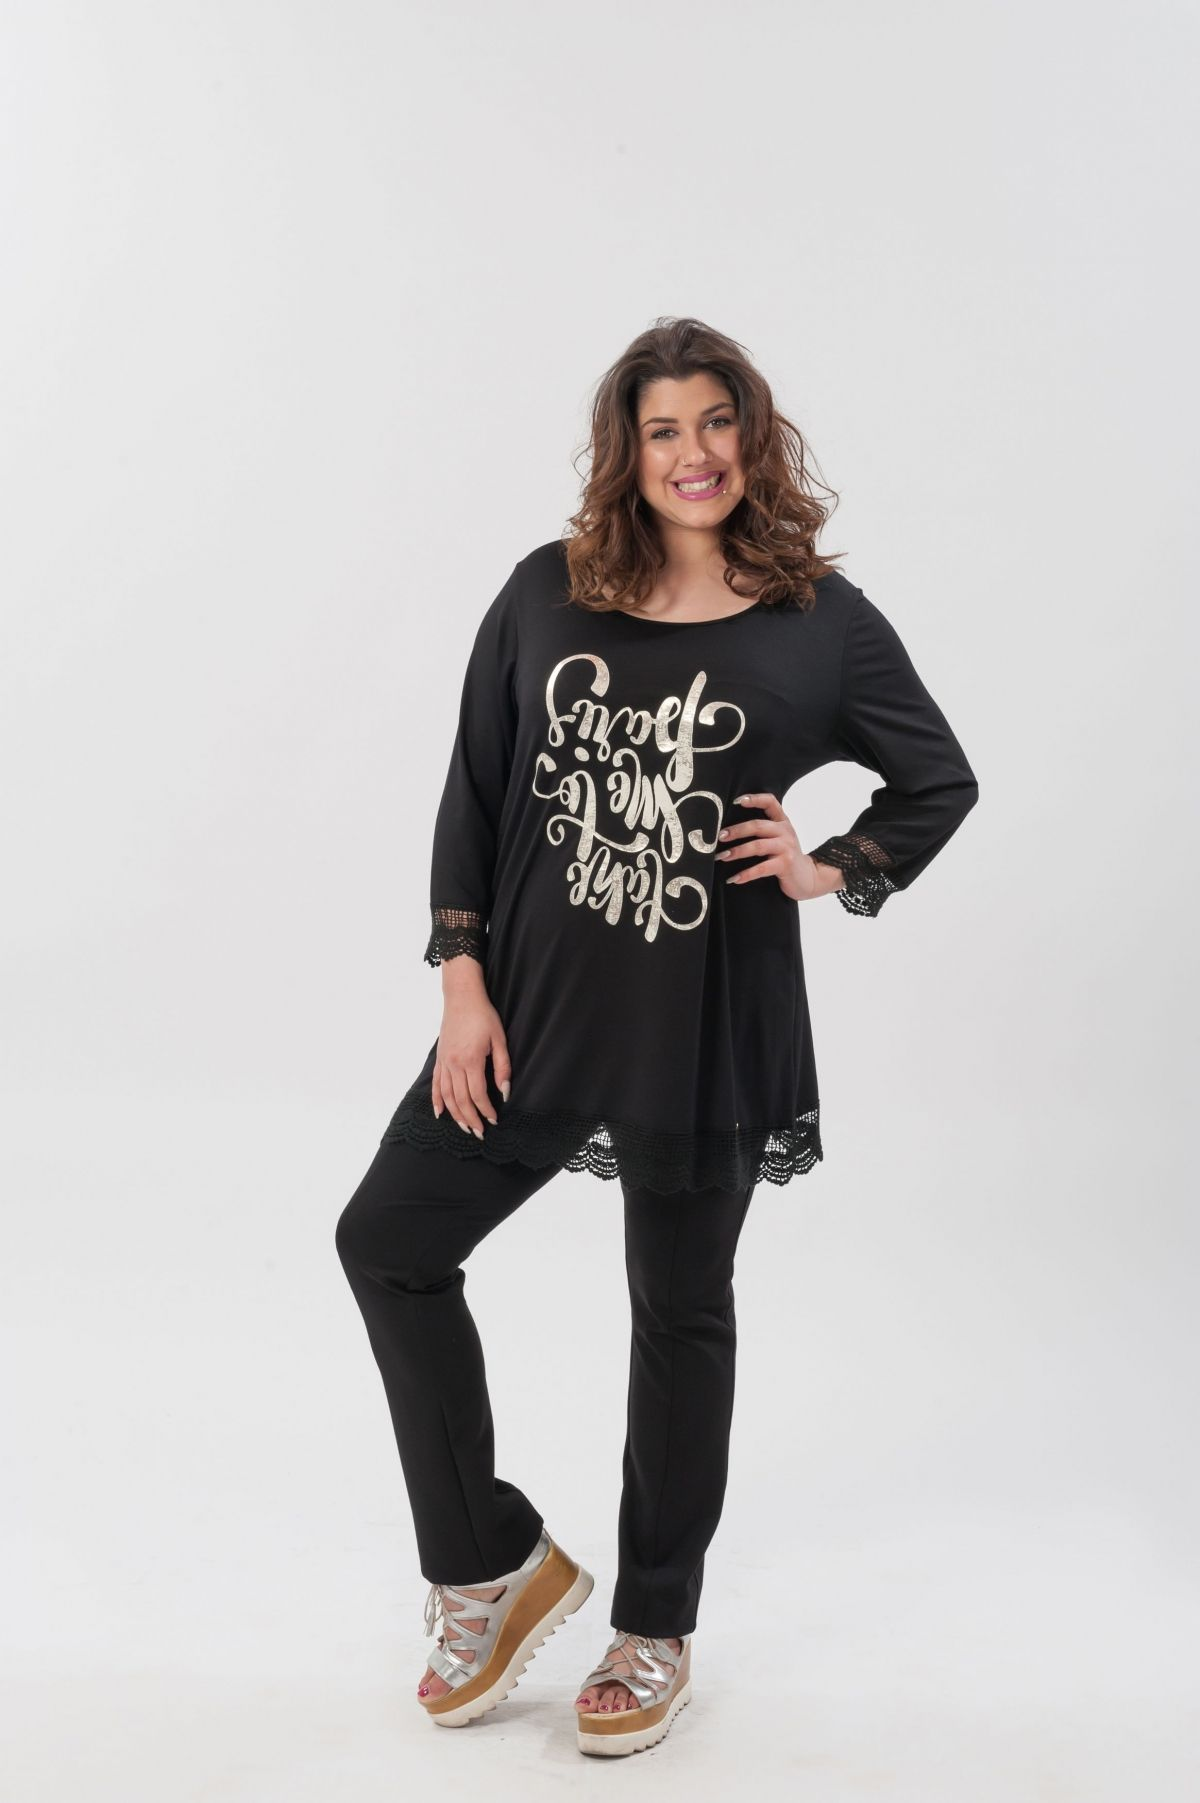 829419ad358d ΜΠΛΟΥΖΑ ΜΕ ΣΤΑΜΠΑ ΚΑΙ ΔΑΝΤΕΛΑ ΣΤΟ ΤΕΛΕΙΩΜΑ - Real Lady - Shop Online